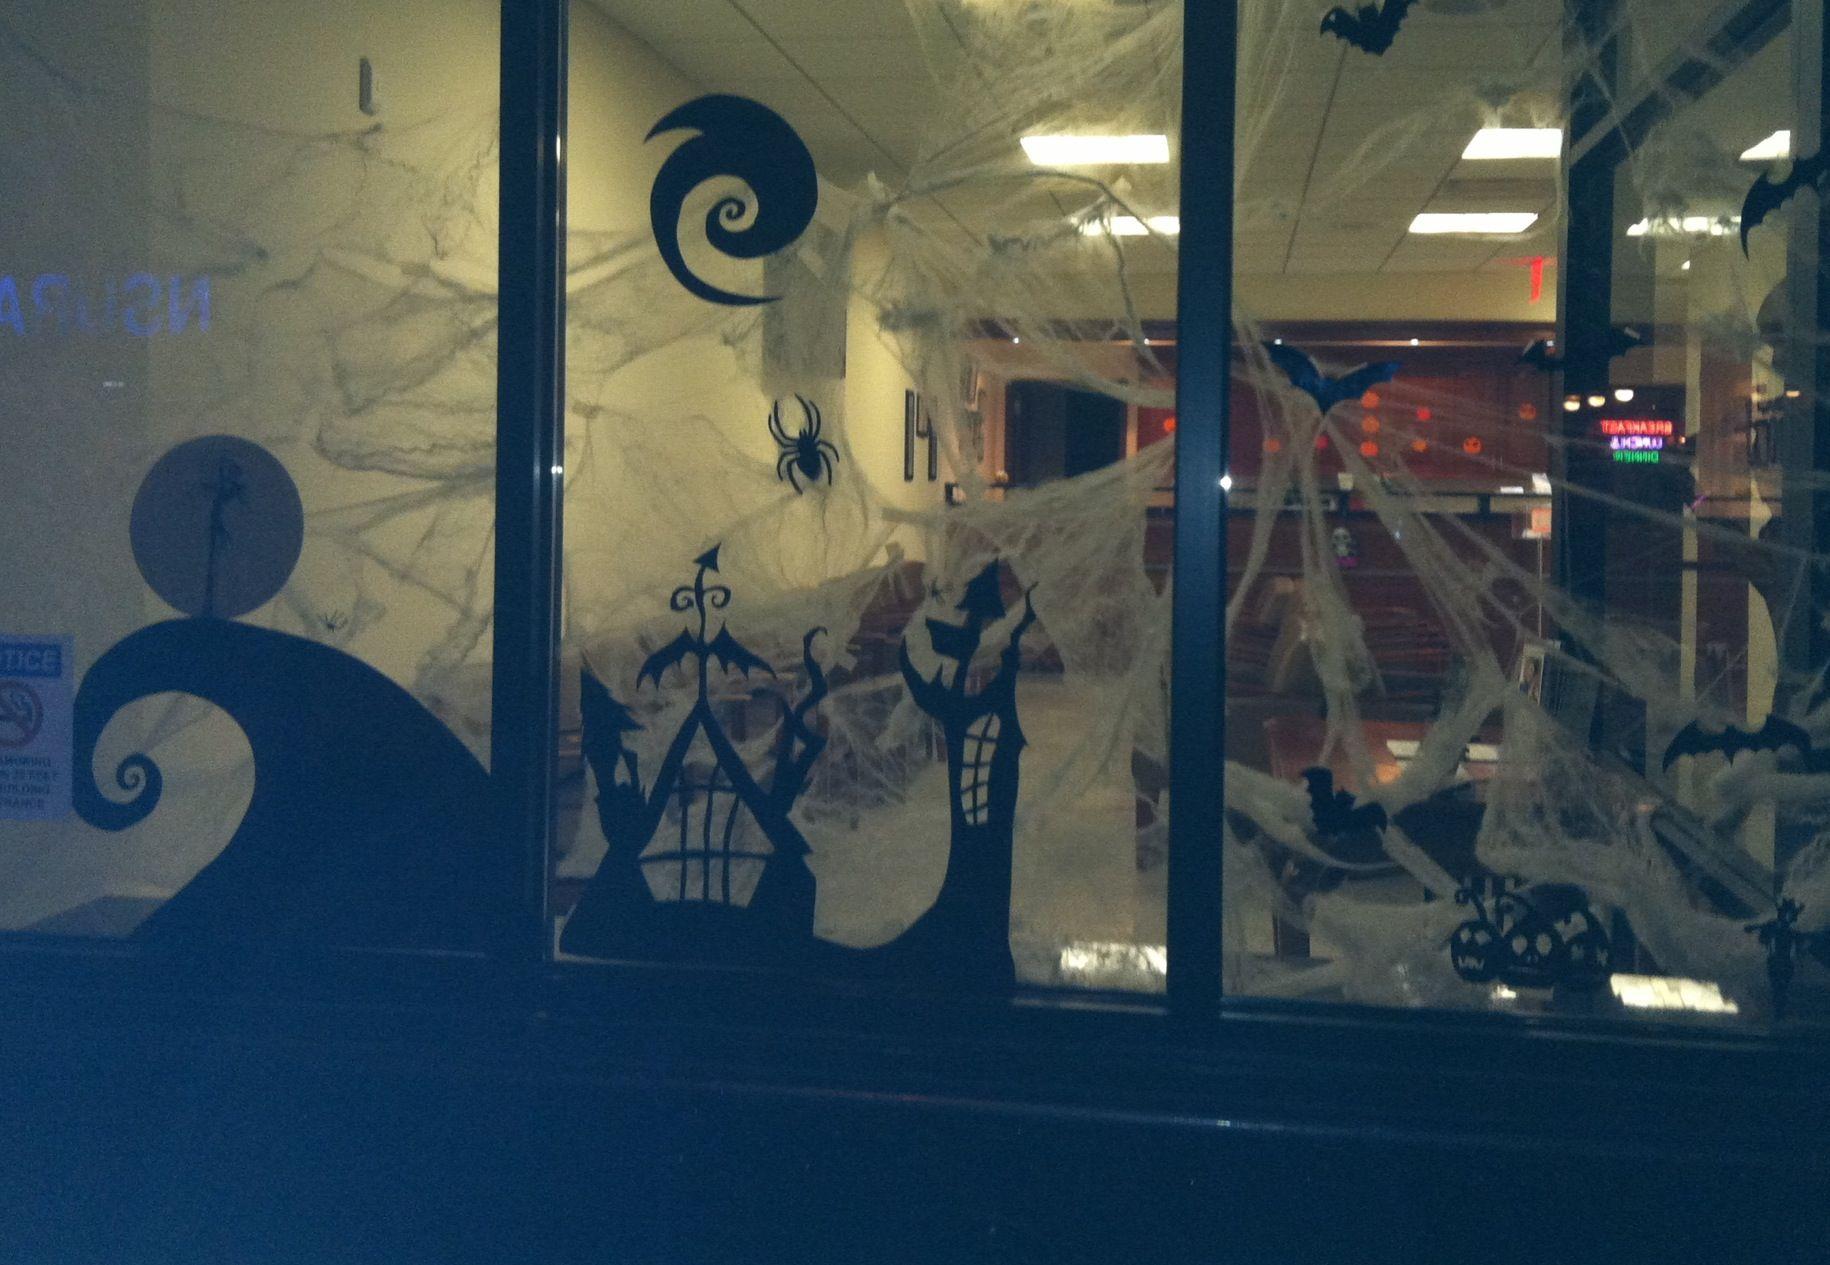 Nightmare before Xmas Halloween decoration in the window ...